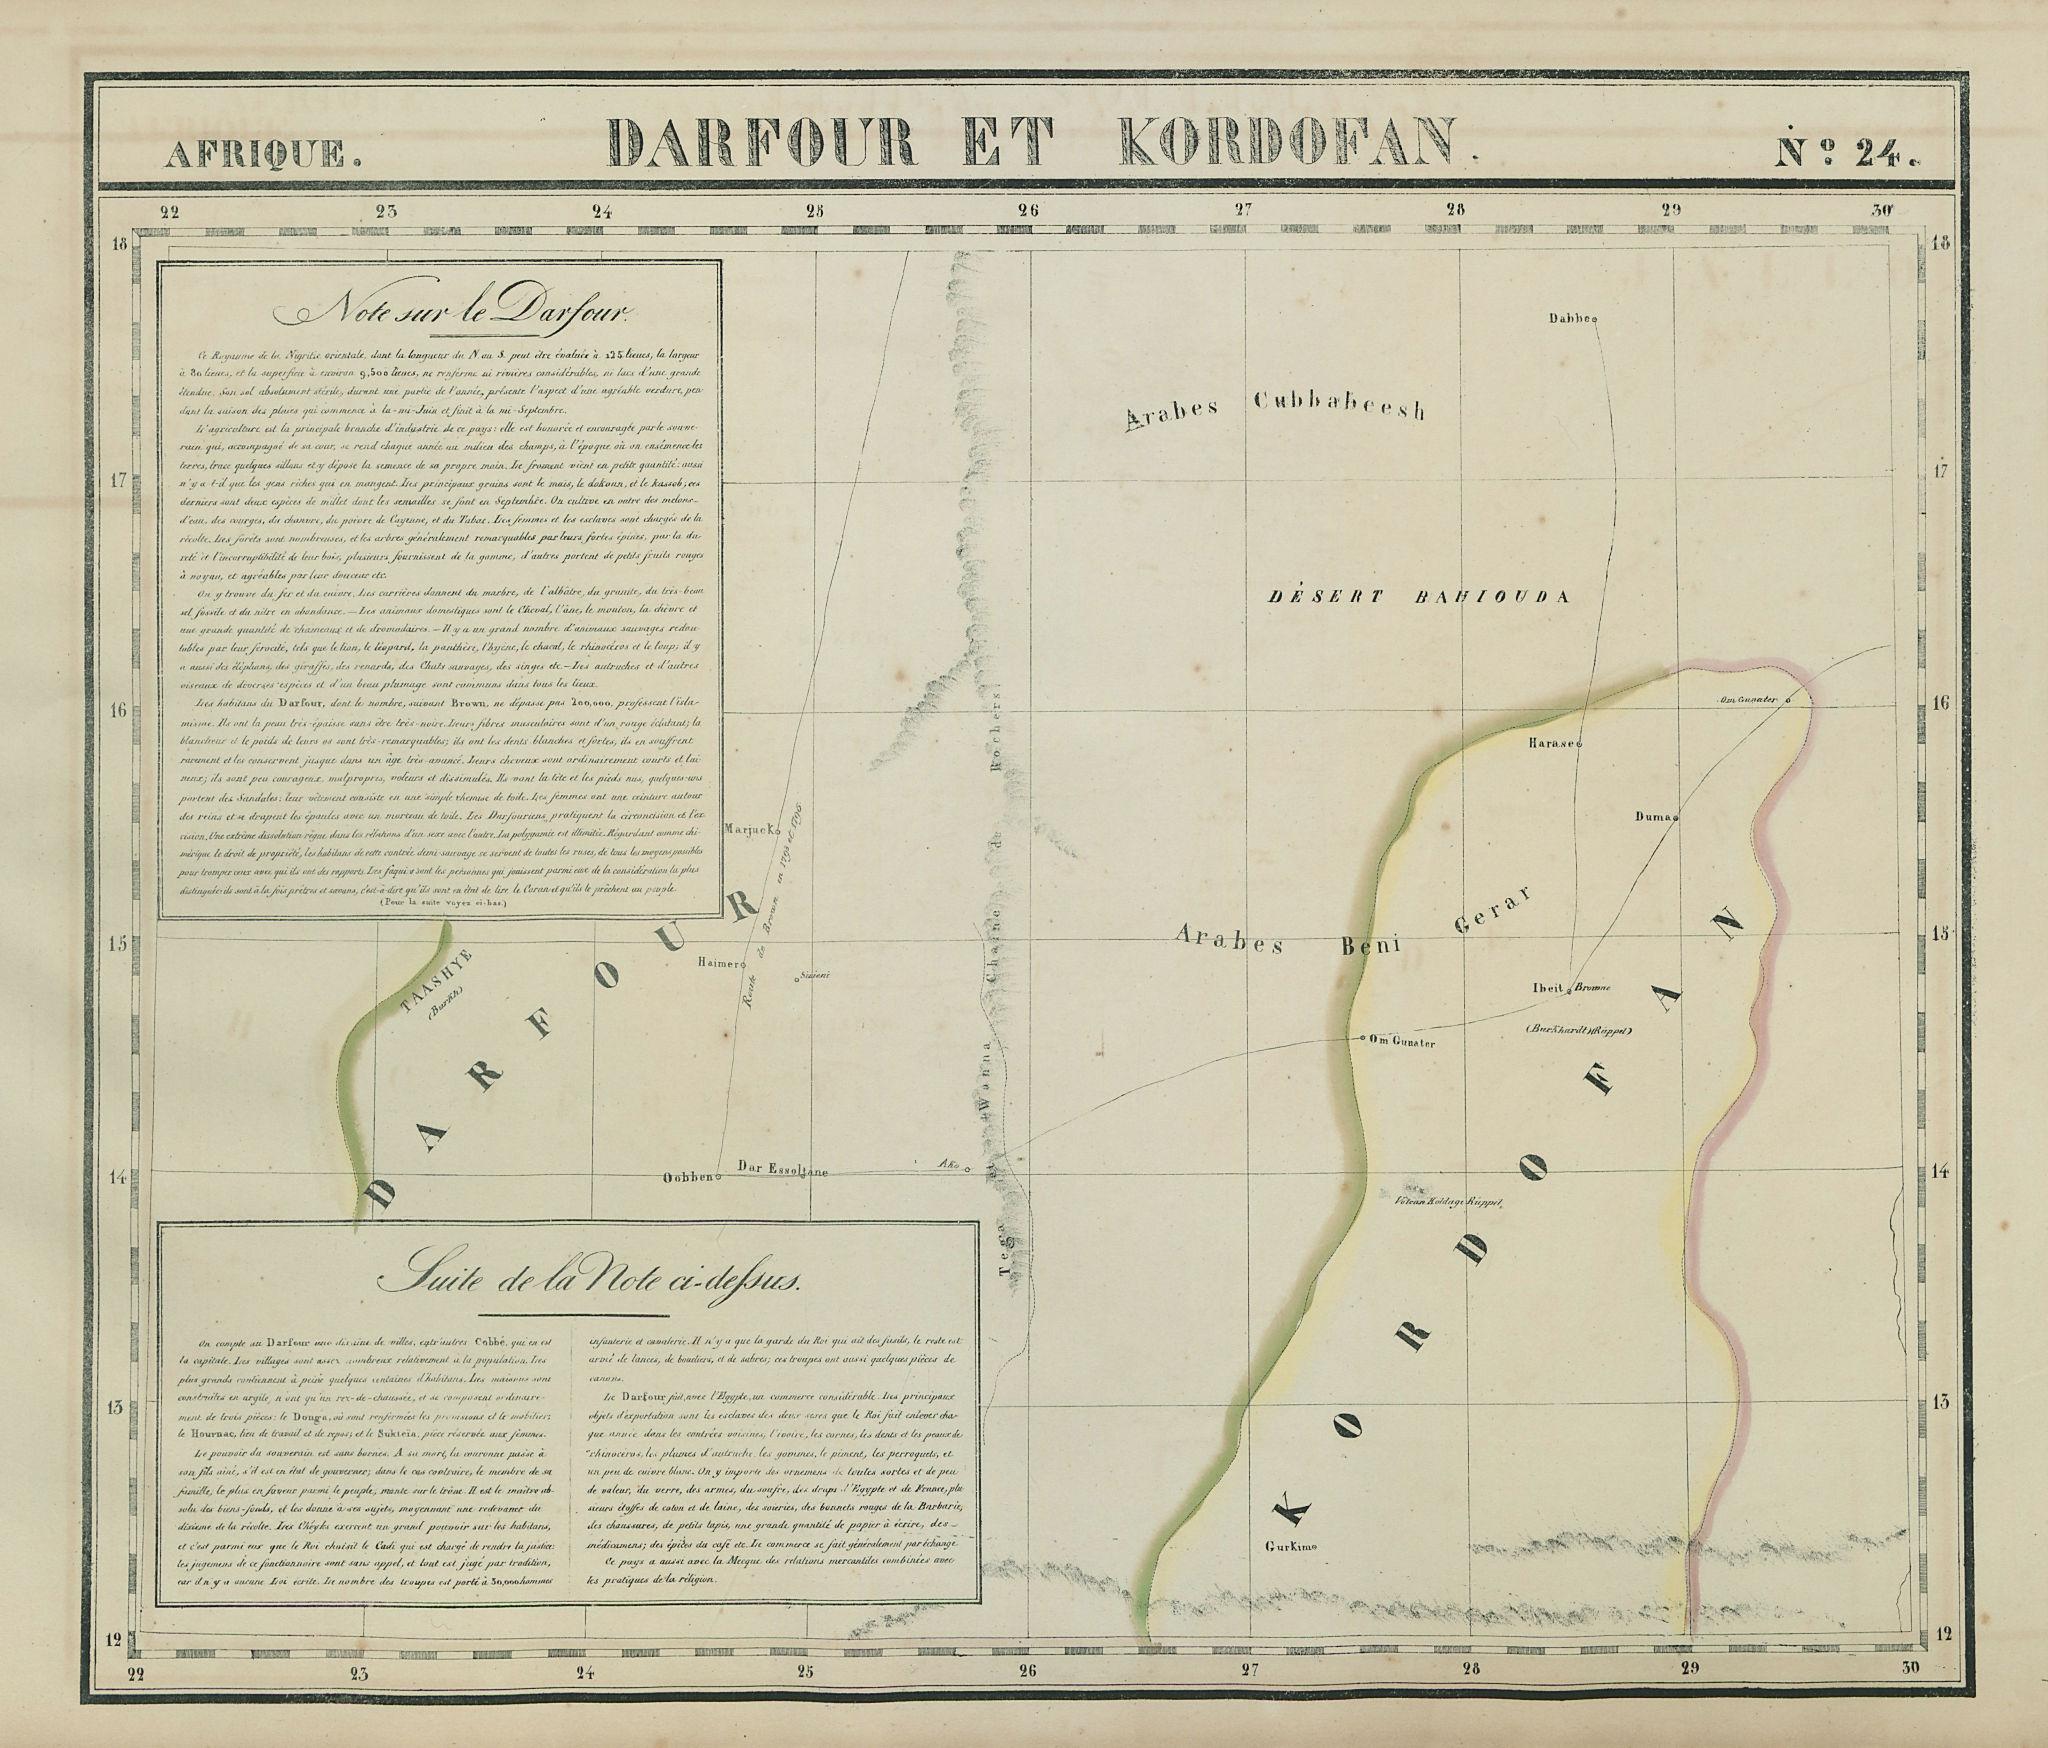 Afrique. Darfour et Kordofan #24. Western Sudan. Darfur. VANDERMAELEN 1827 map